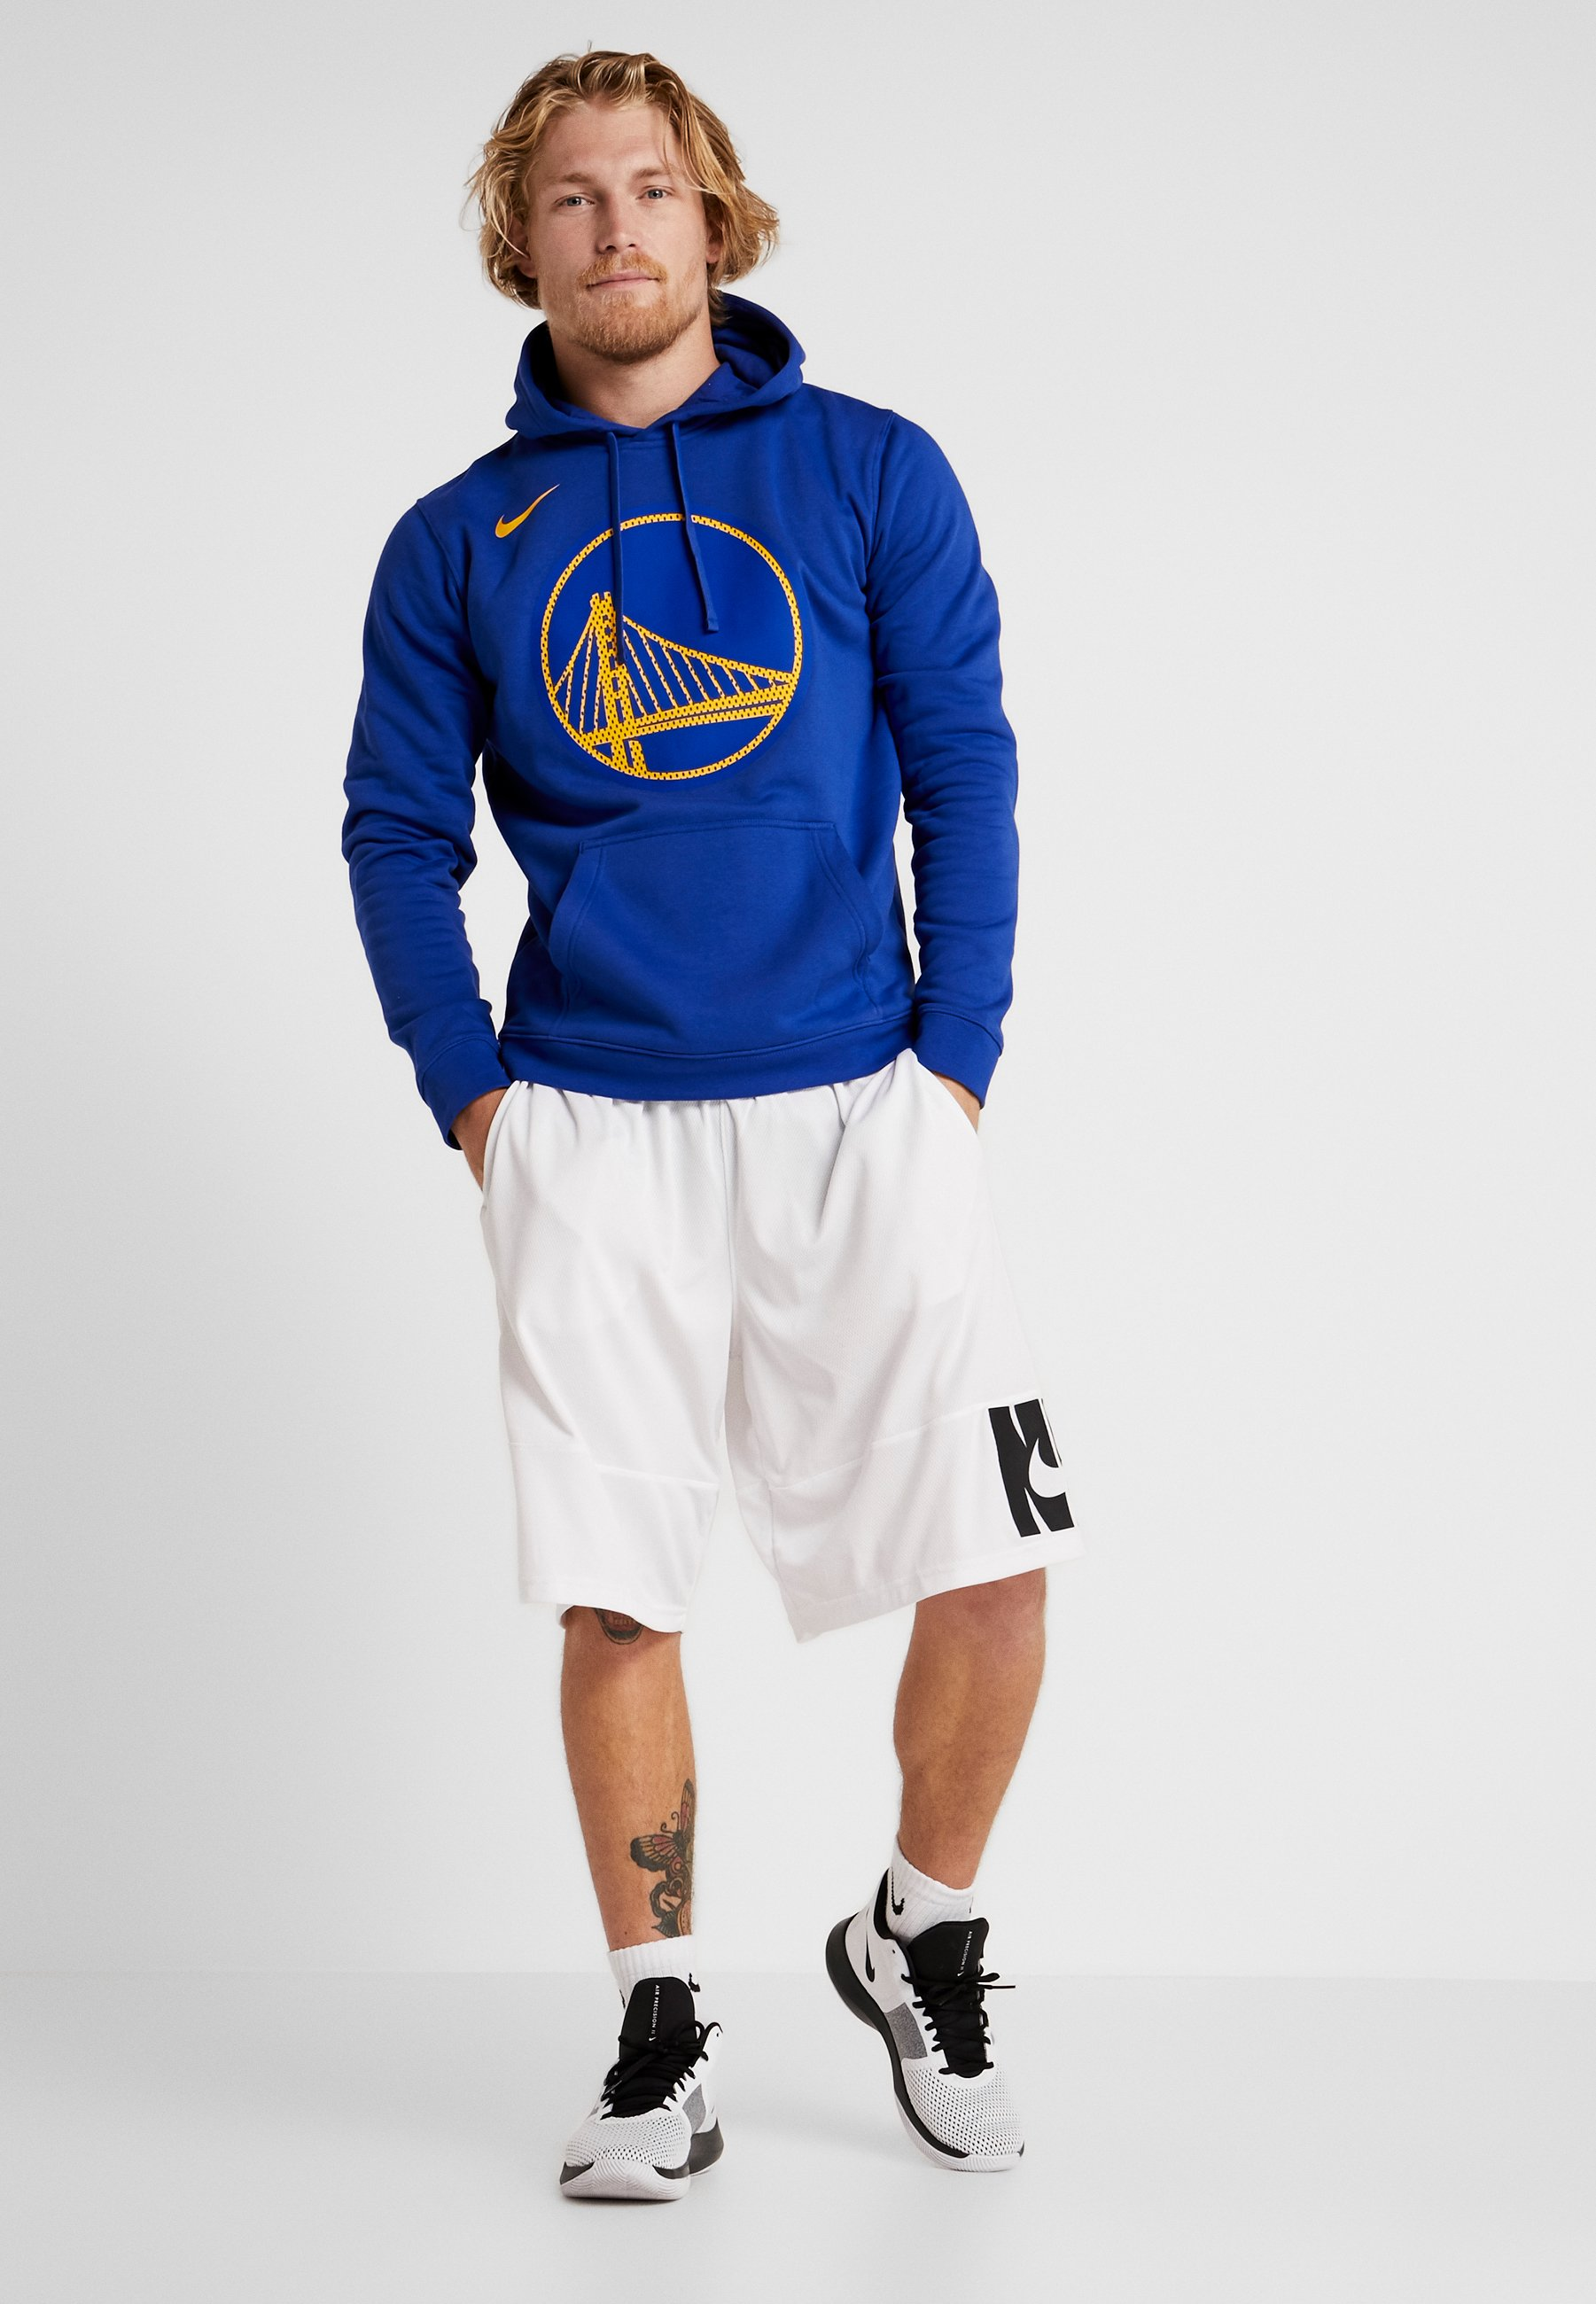 NBA GOLDEN STATE WARRIORS LOGO HOODIE Fanartikel rush blue